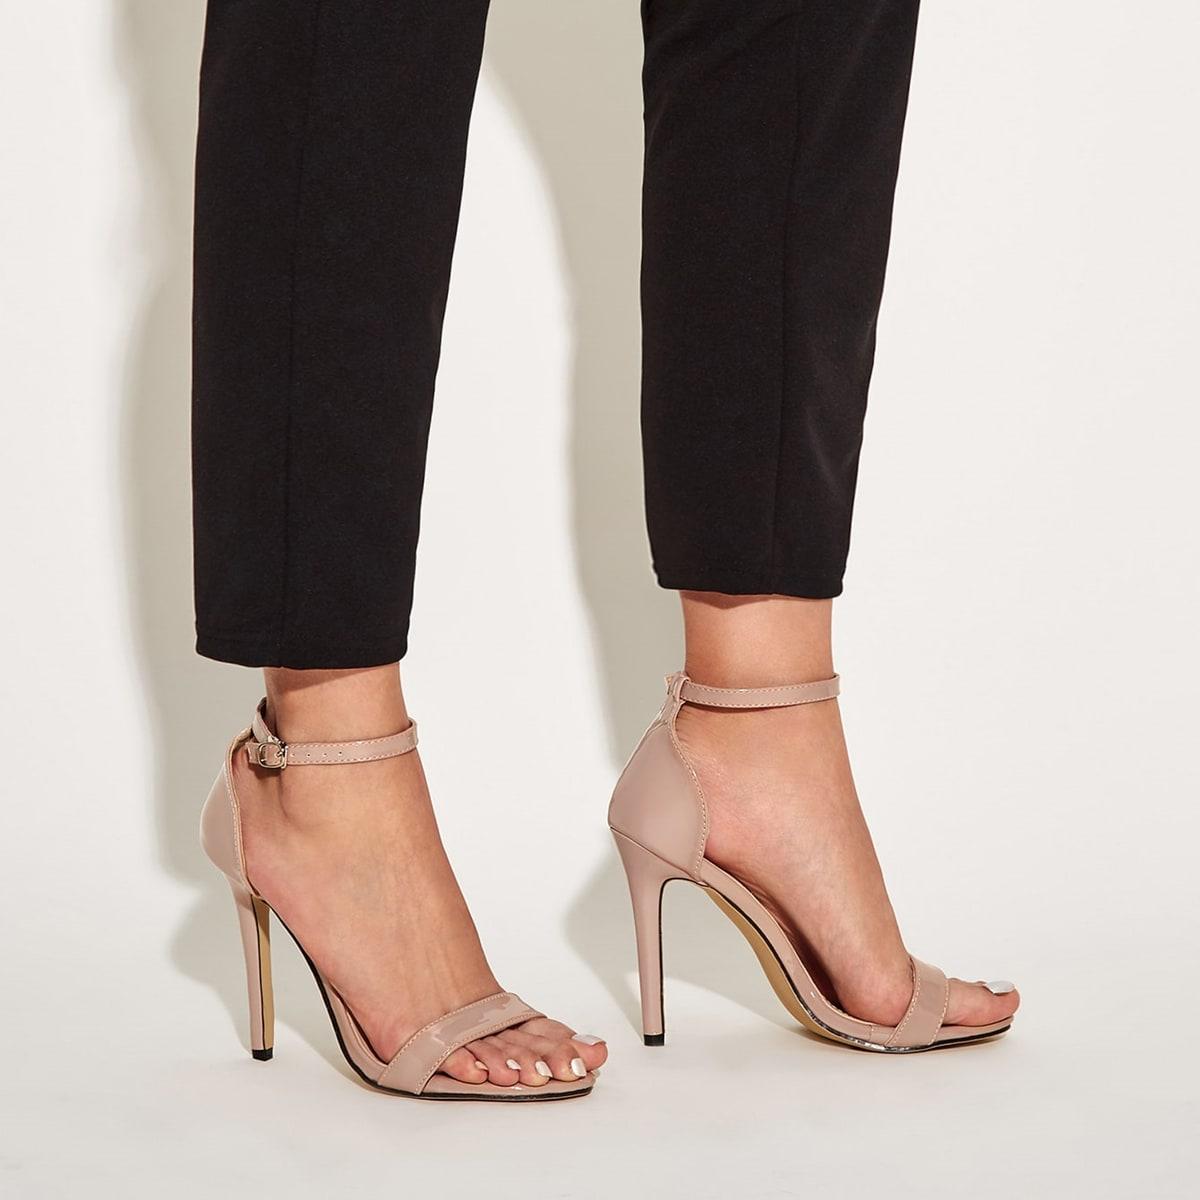 Minimalist Stiletto Heeled Sandals